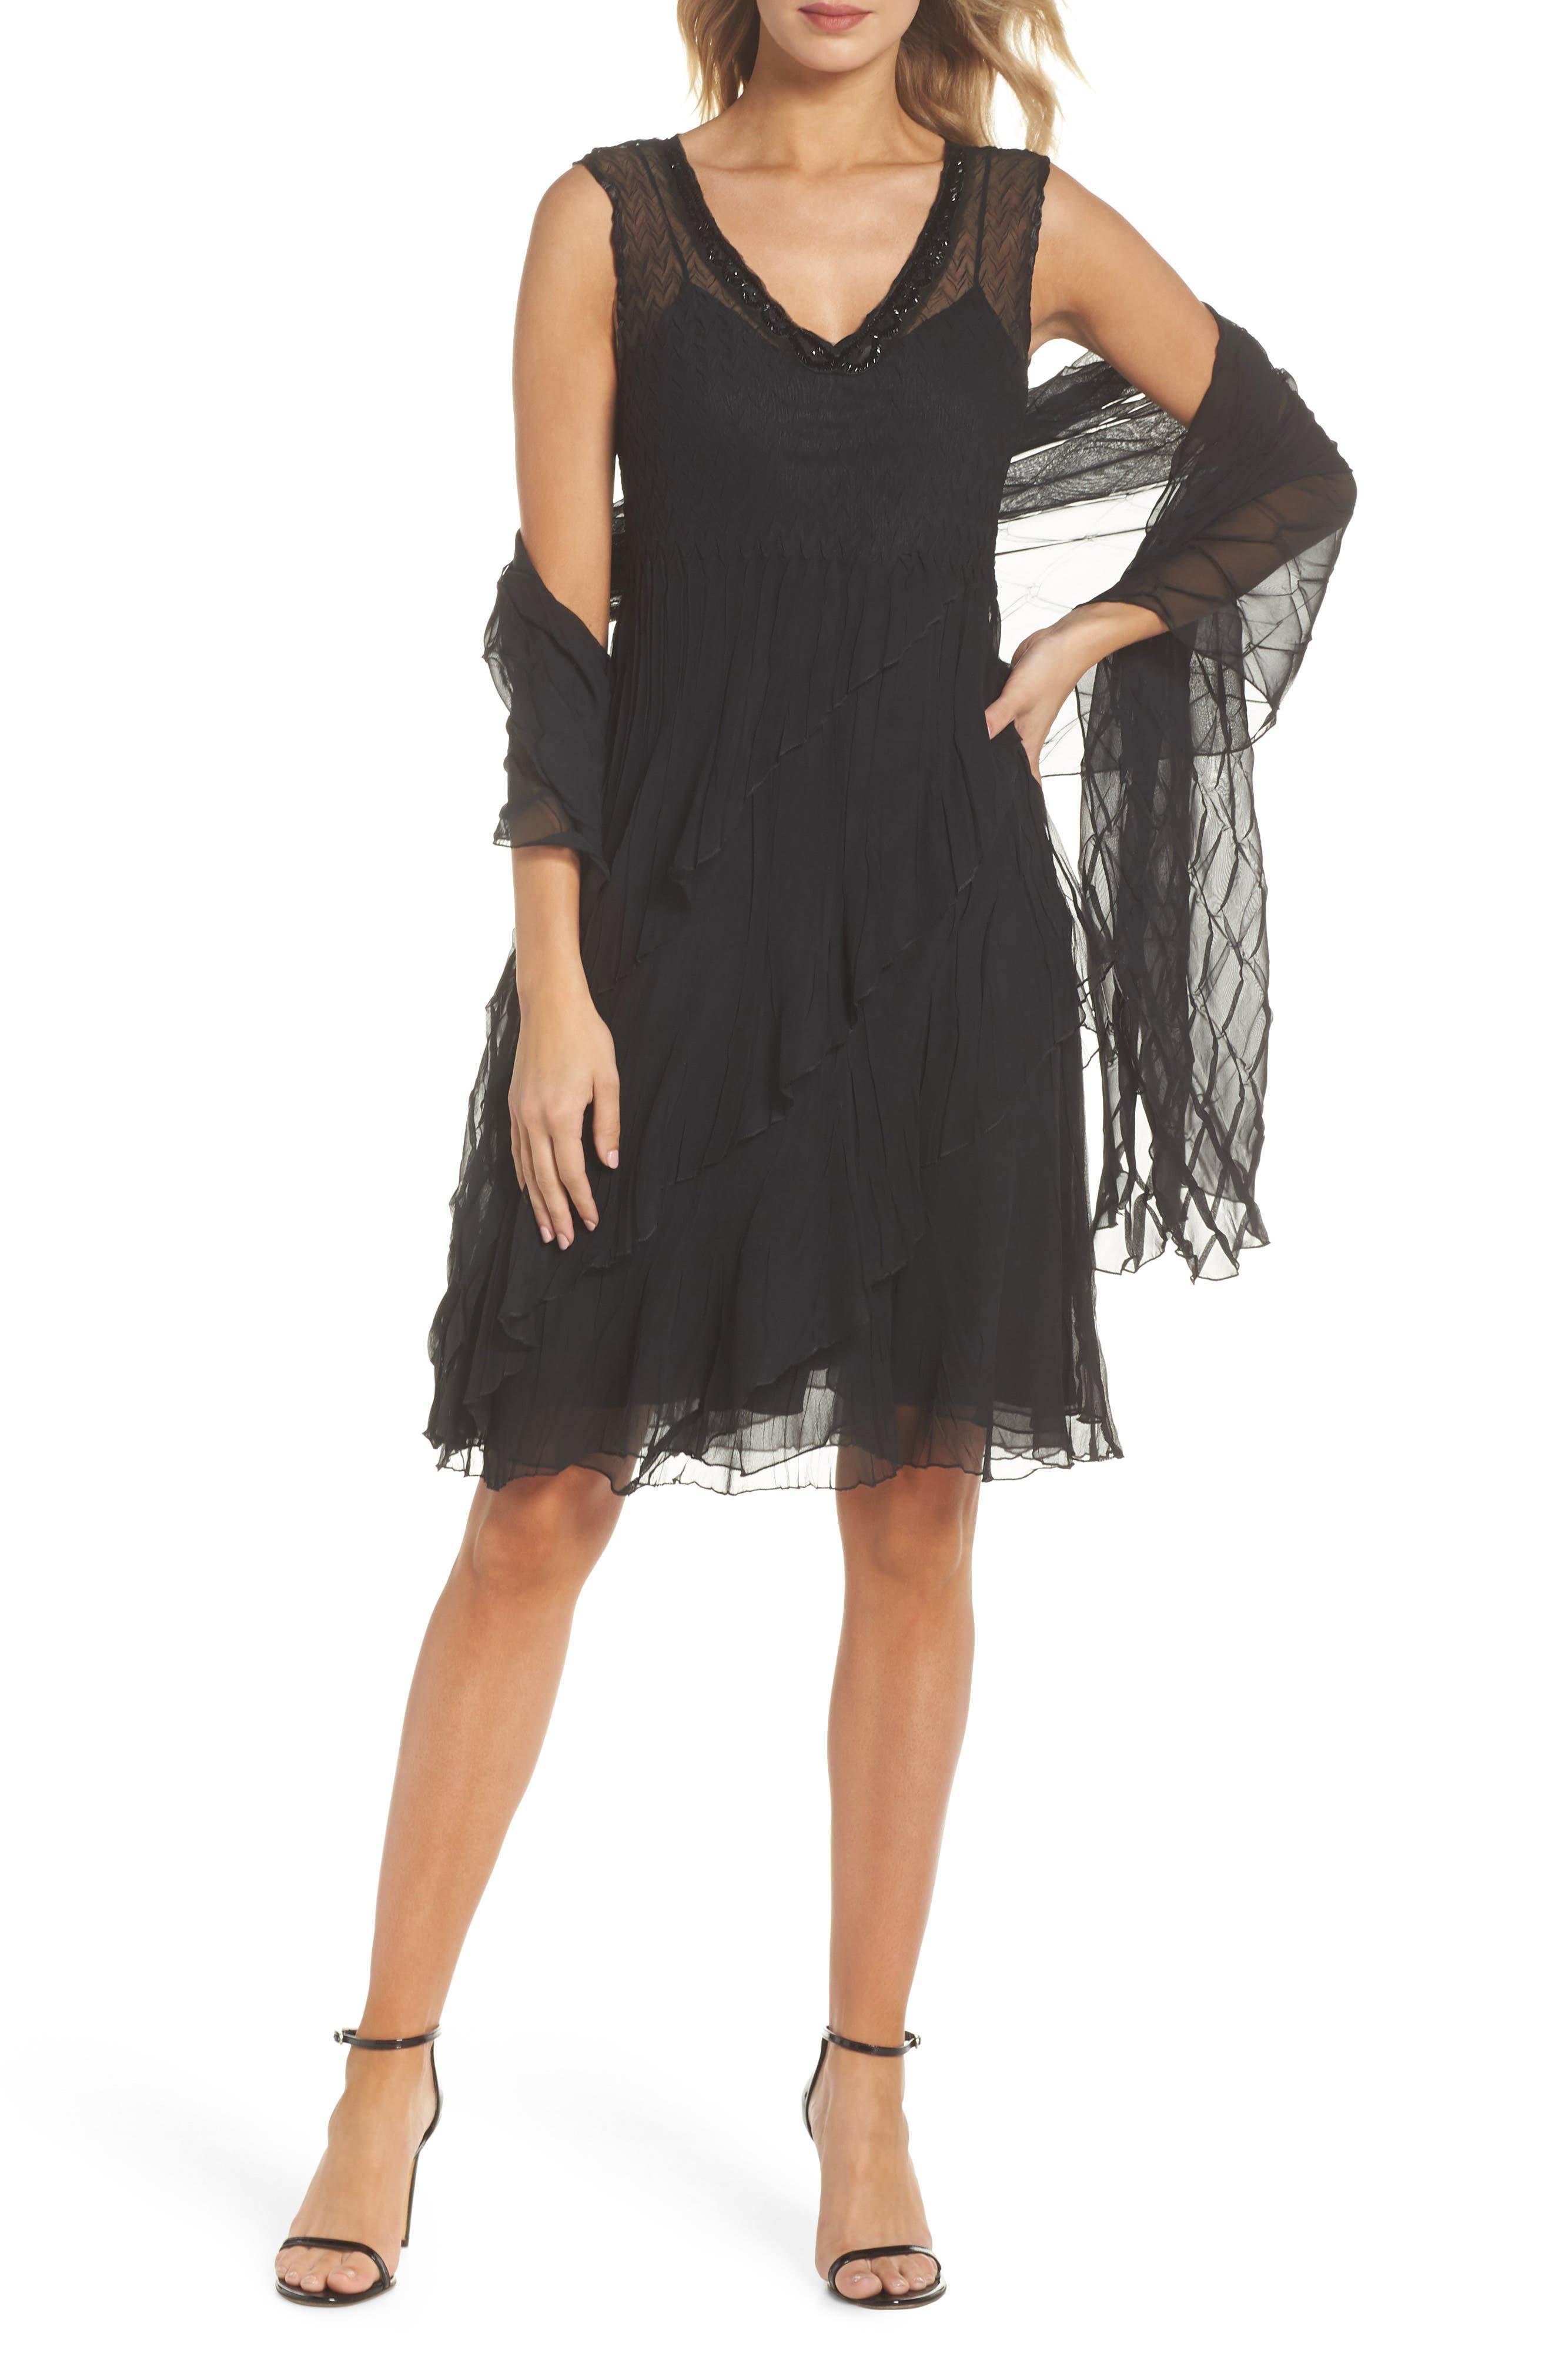 KOMAROV, Bead Trim Chiffon Dress with Wrap, Main thumbnail 1, color, BLACK